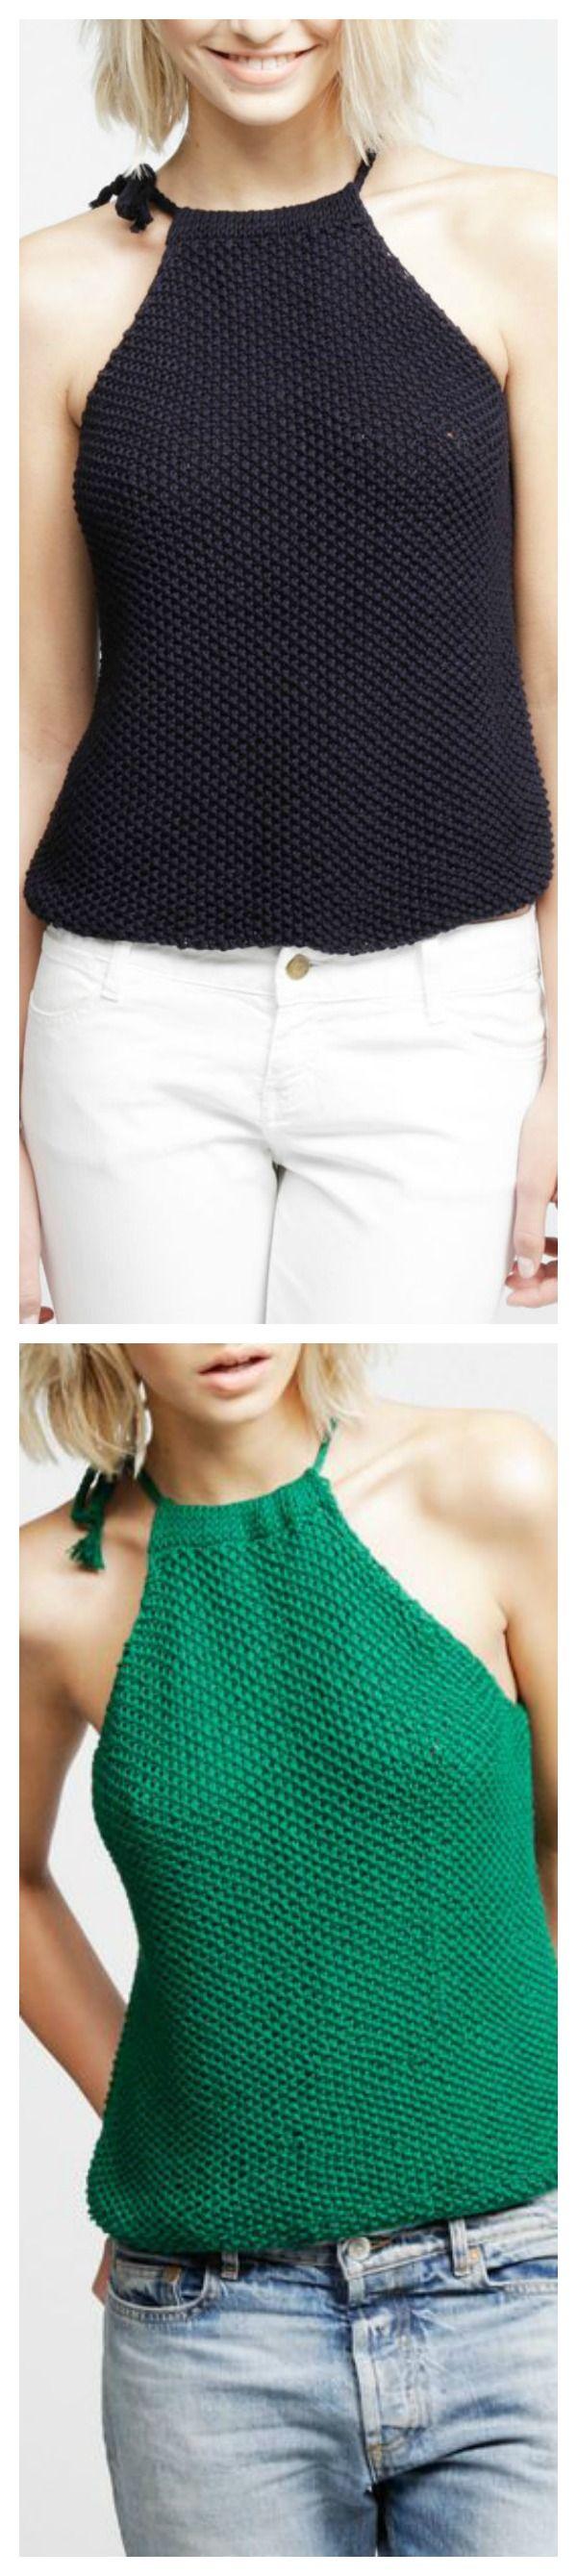 Fashion Knit Halter Top